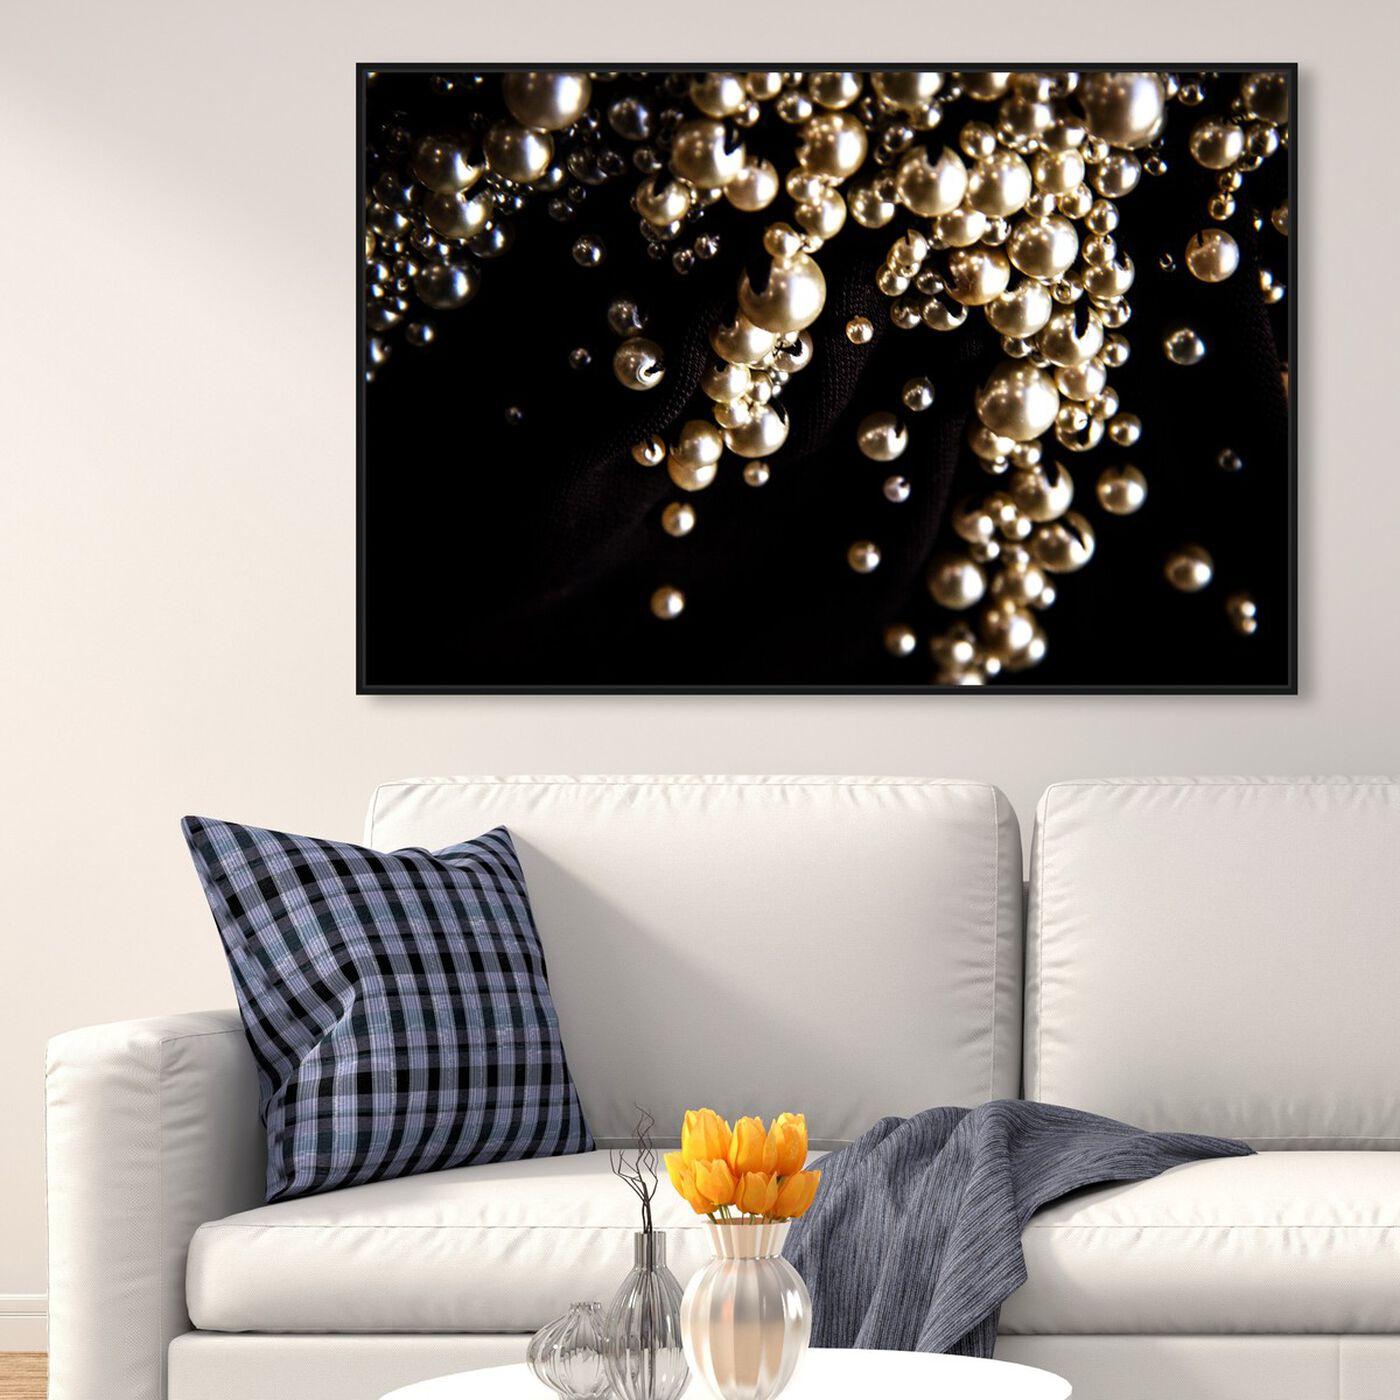 Hanging view of Mark Zunino - Raining Beads III featuring fashion and glam and jewelry art.